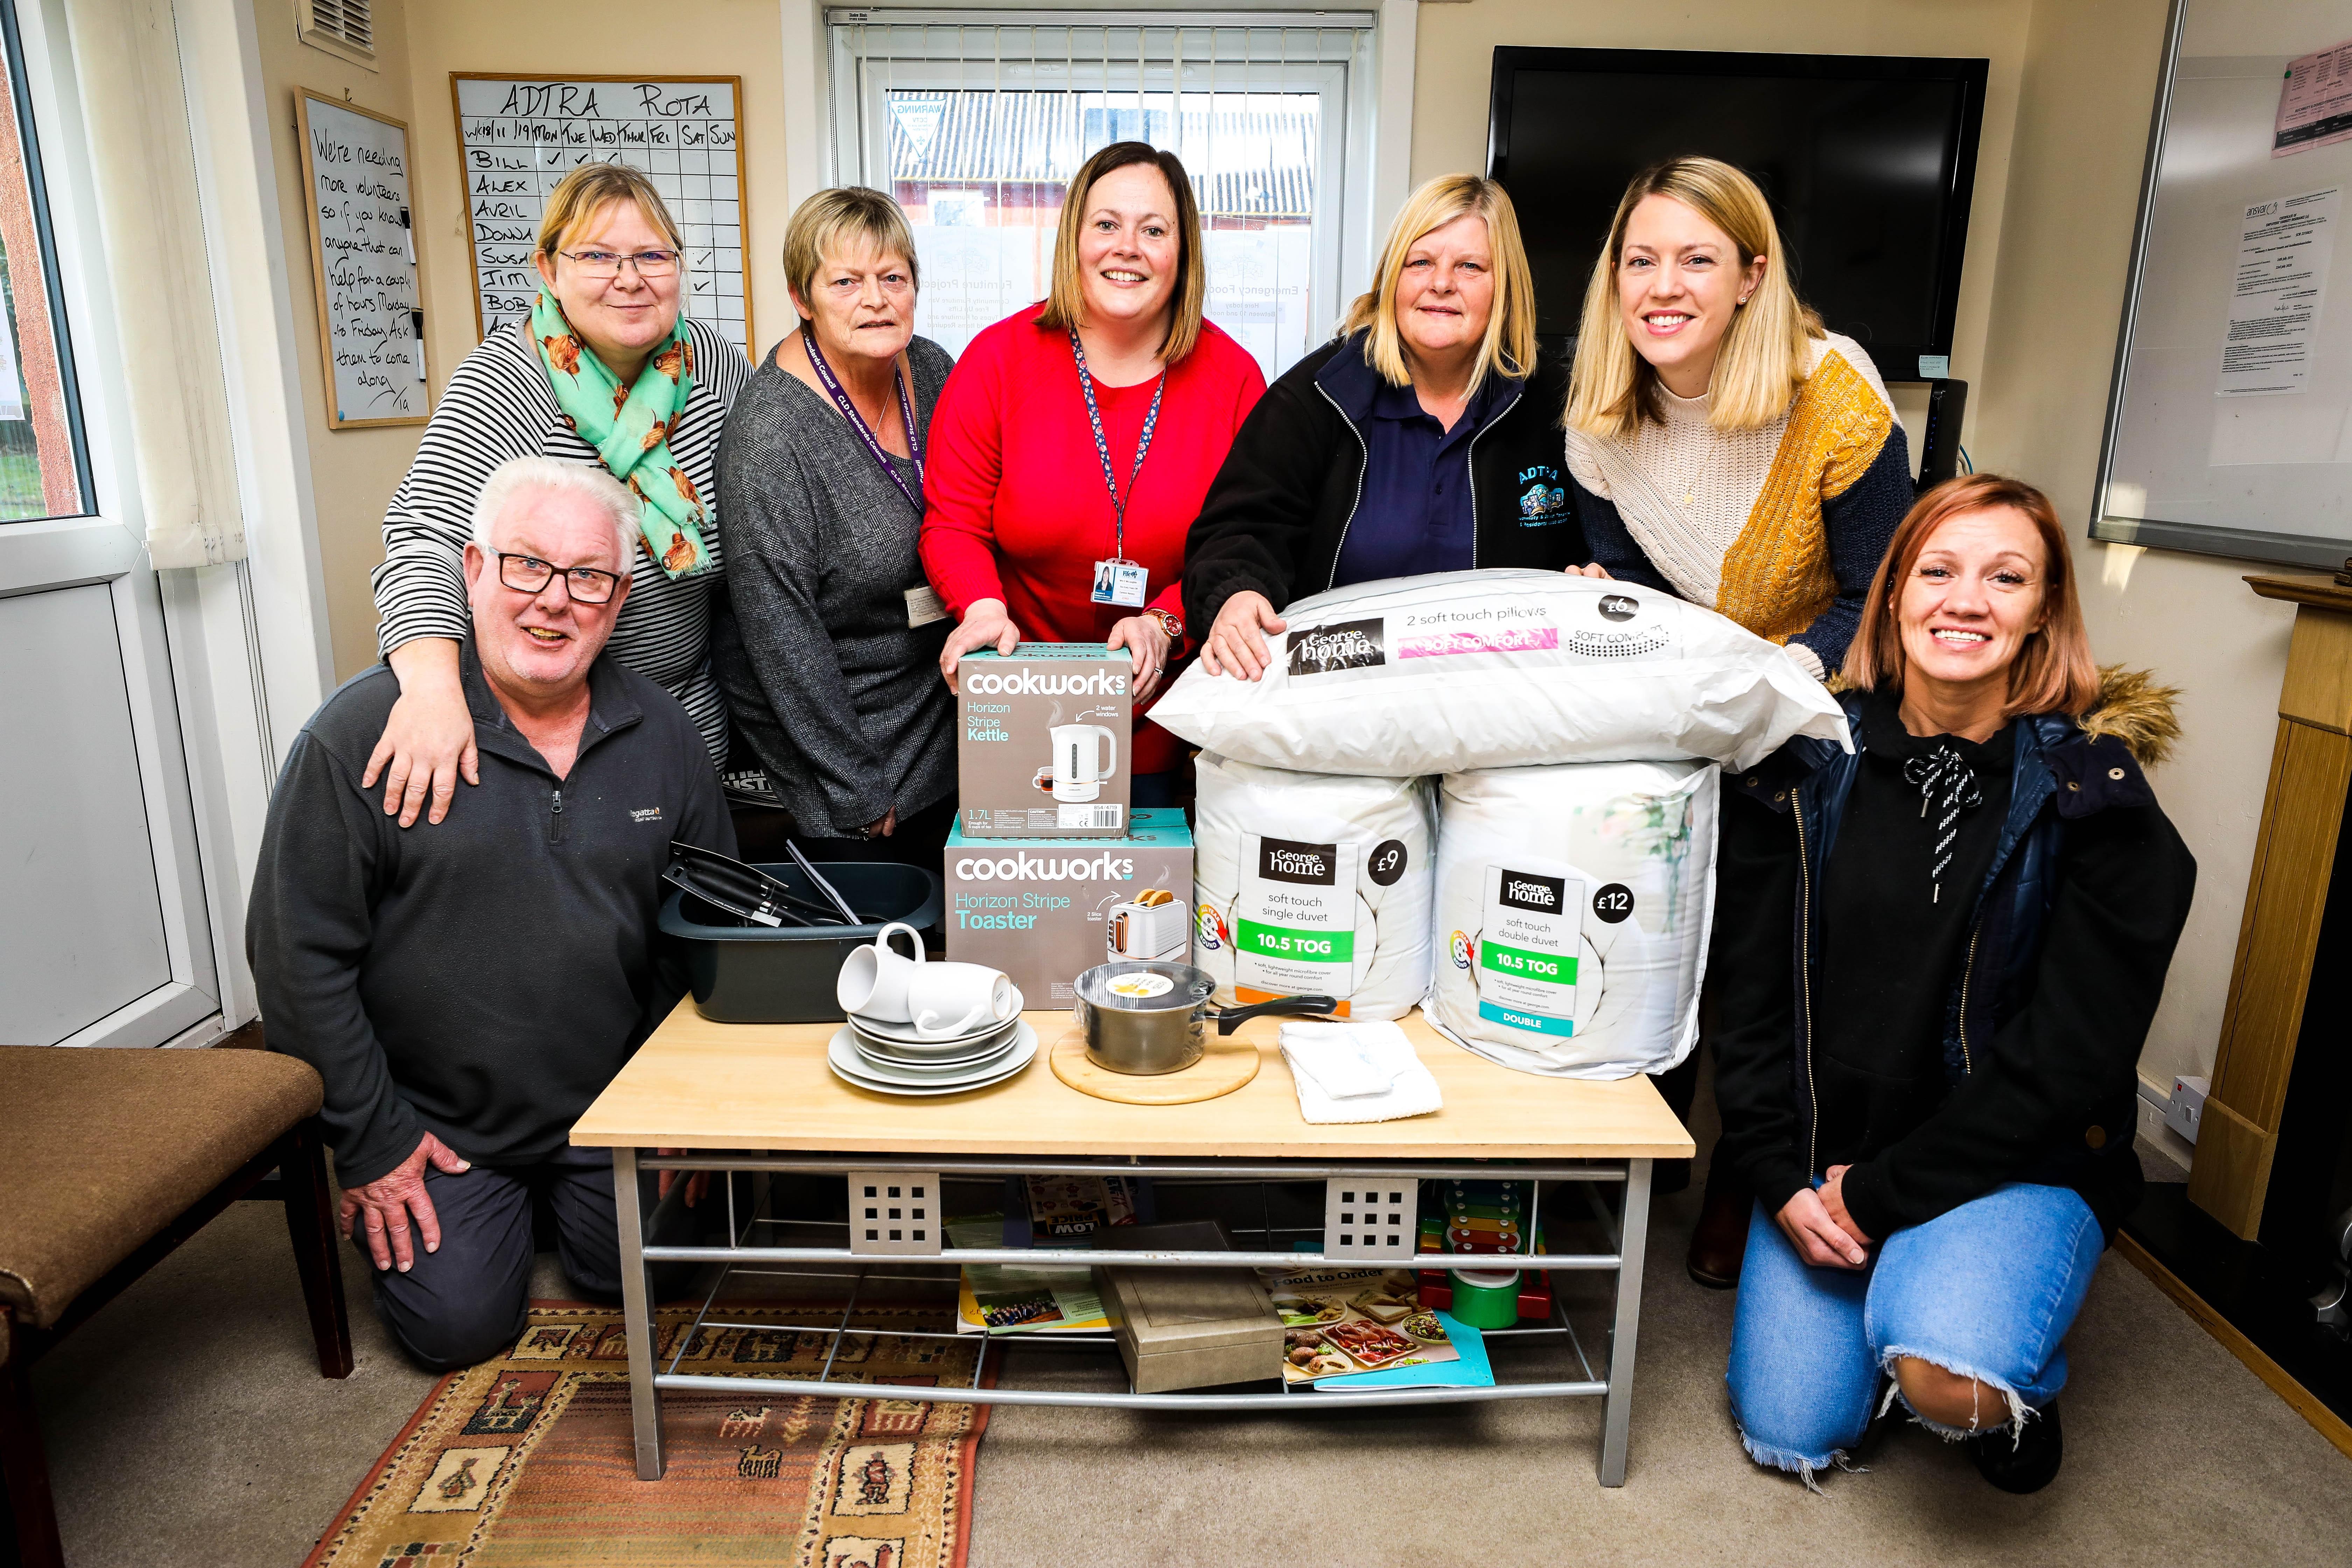 Bill Forbes, Alex Thomson, Shirley Crawley, Courtney McLaughlin (Carlton Nursery), Donna Hancock, Jenny Gilruth and Amanda O'Neill.